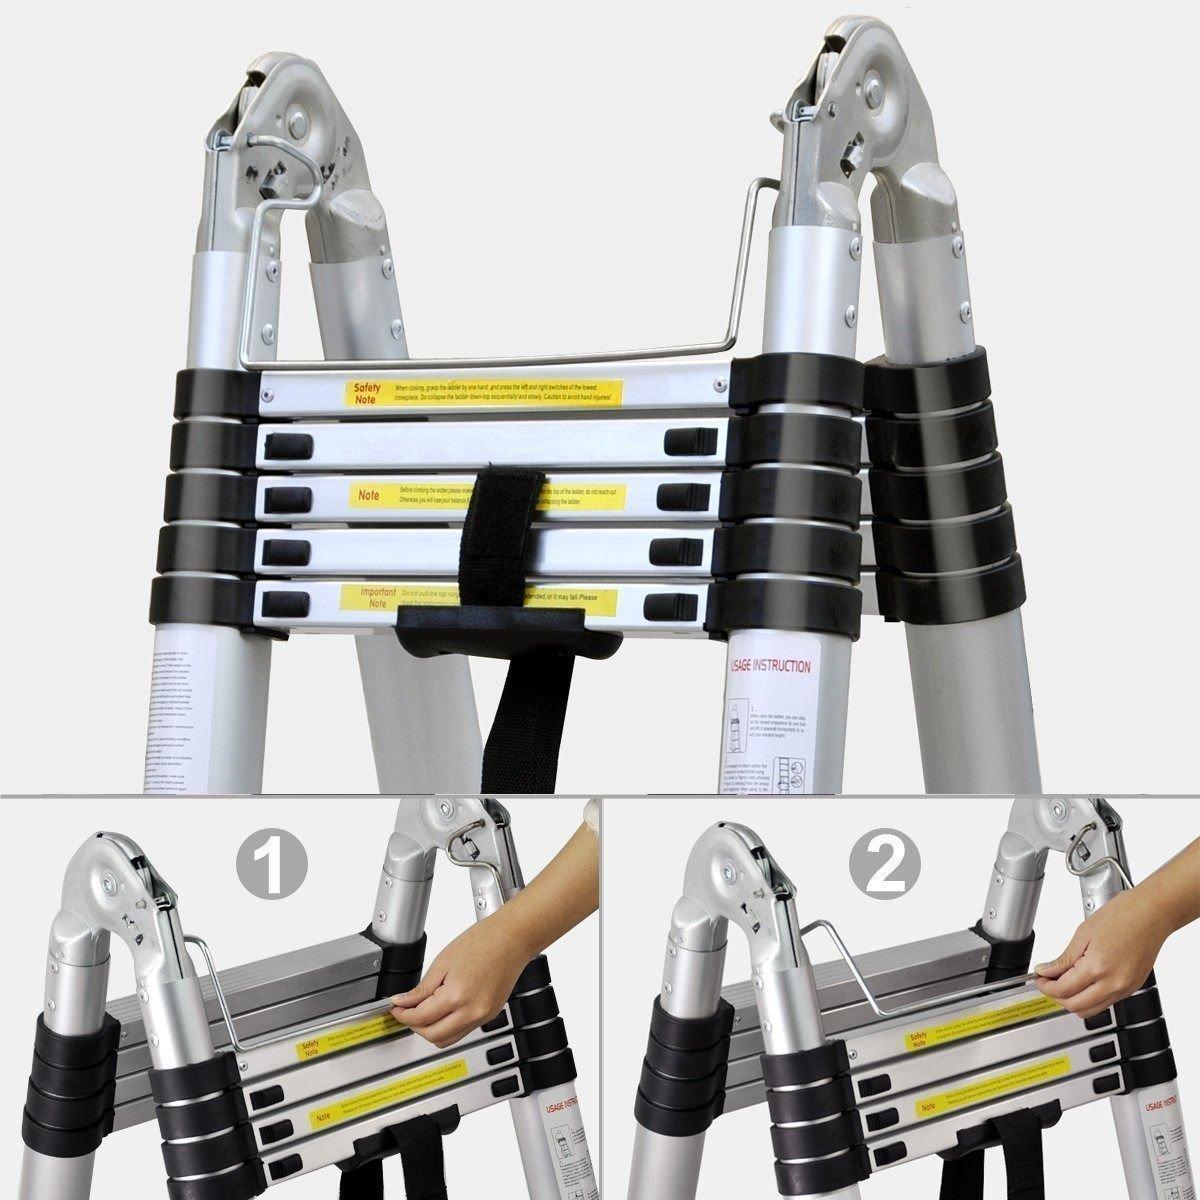 16.4 FT Telescopic Ladder Aluminum Telescoping Ladder Extension A-Fram Multi-Purpose Step-Ladder Folding Ladder 8.2 ft 5M=2.5M+2.5M 8.2 ft with Spring Load Locking Mechanism